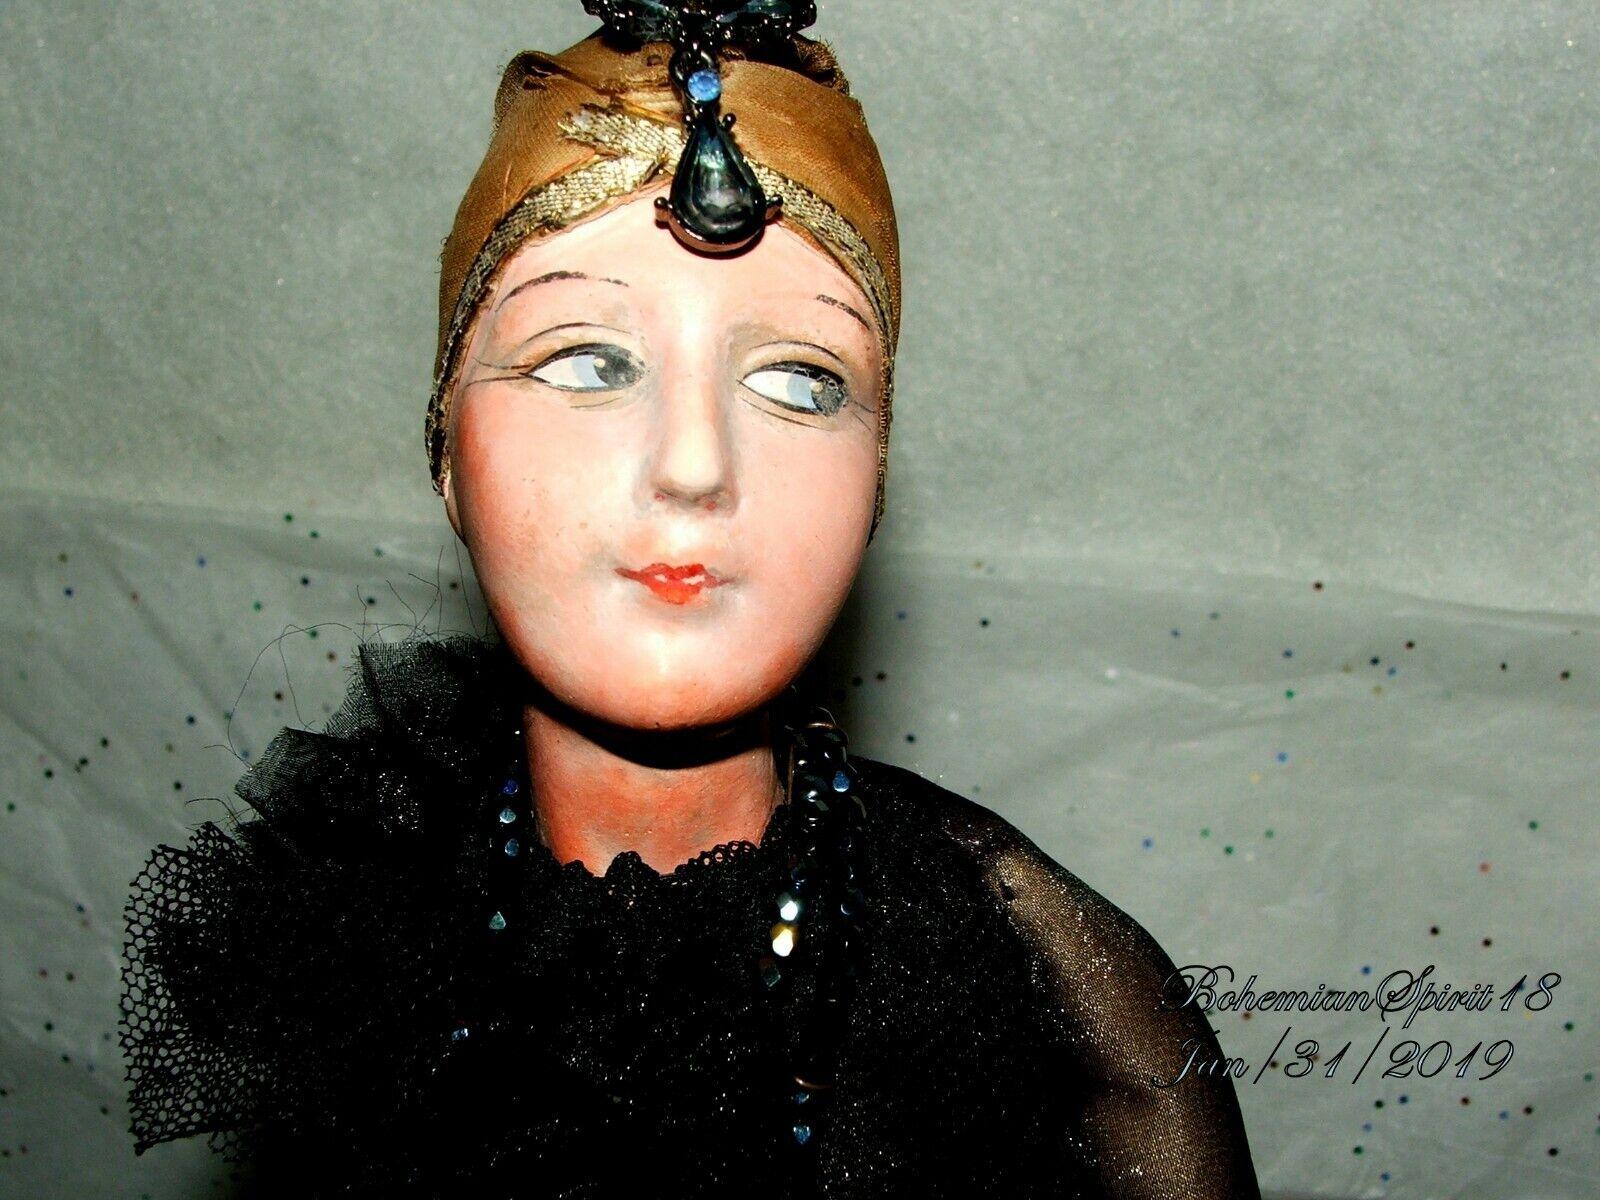 Raro Antiguo Década de 1920 Aleta Negro Encaje Vestido Porcelana Biscuit muñeca de tela